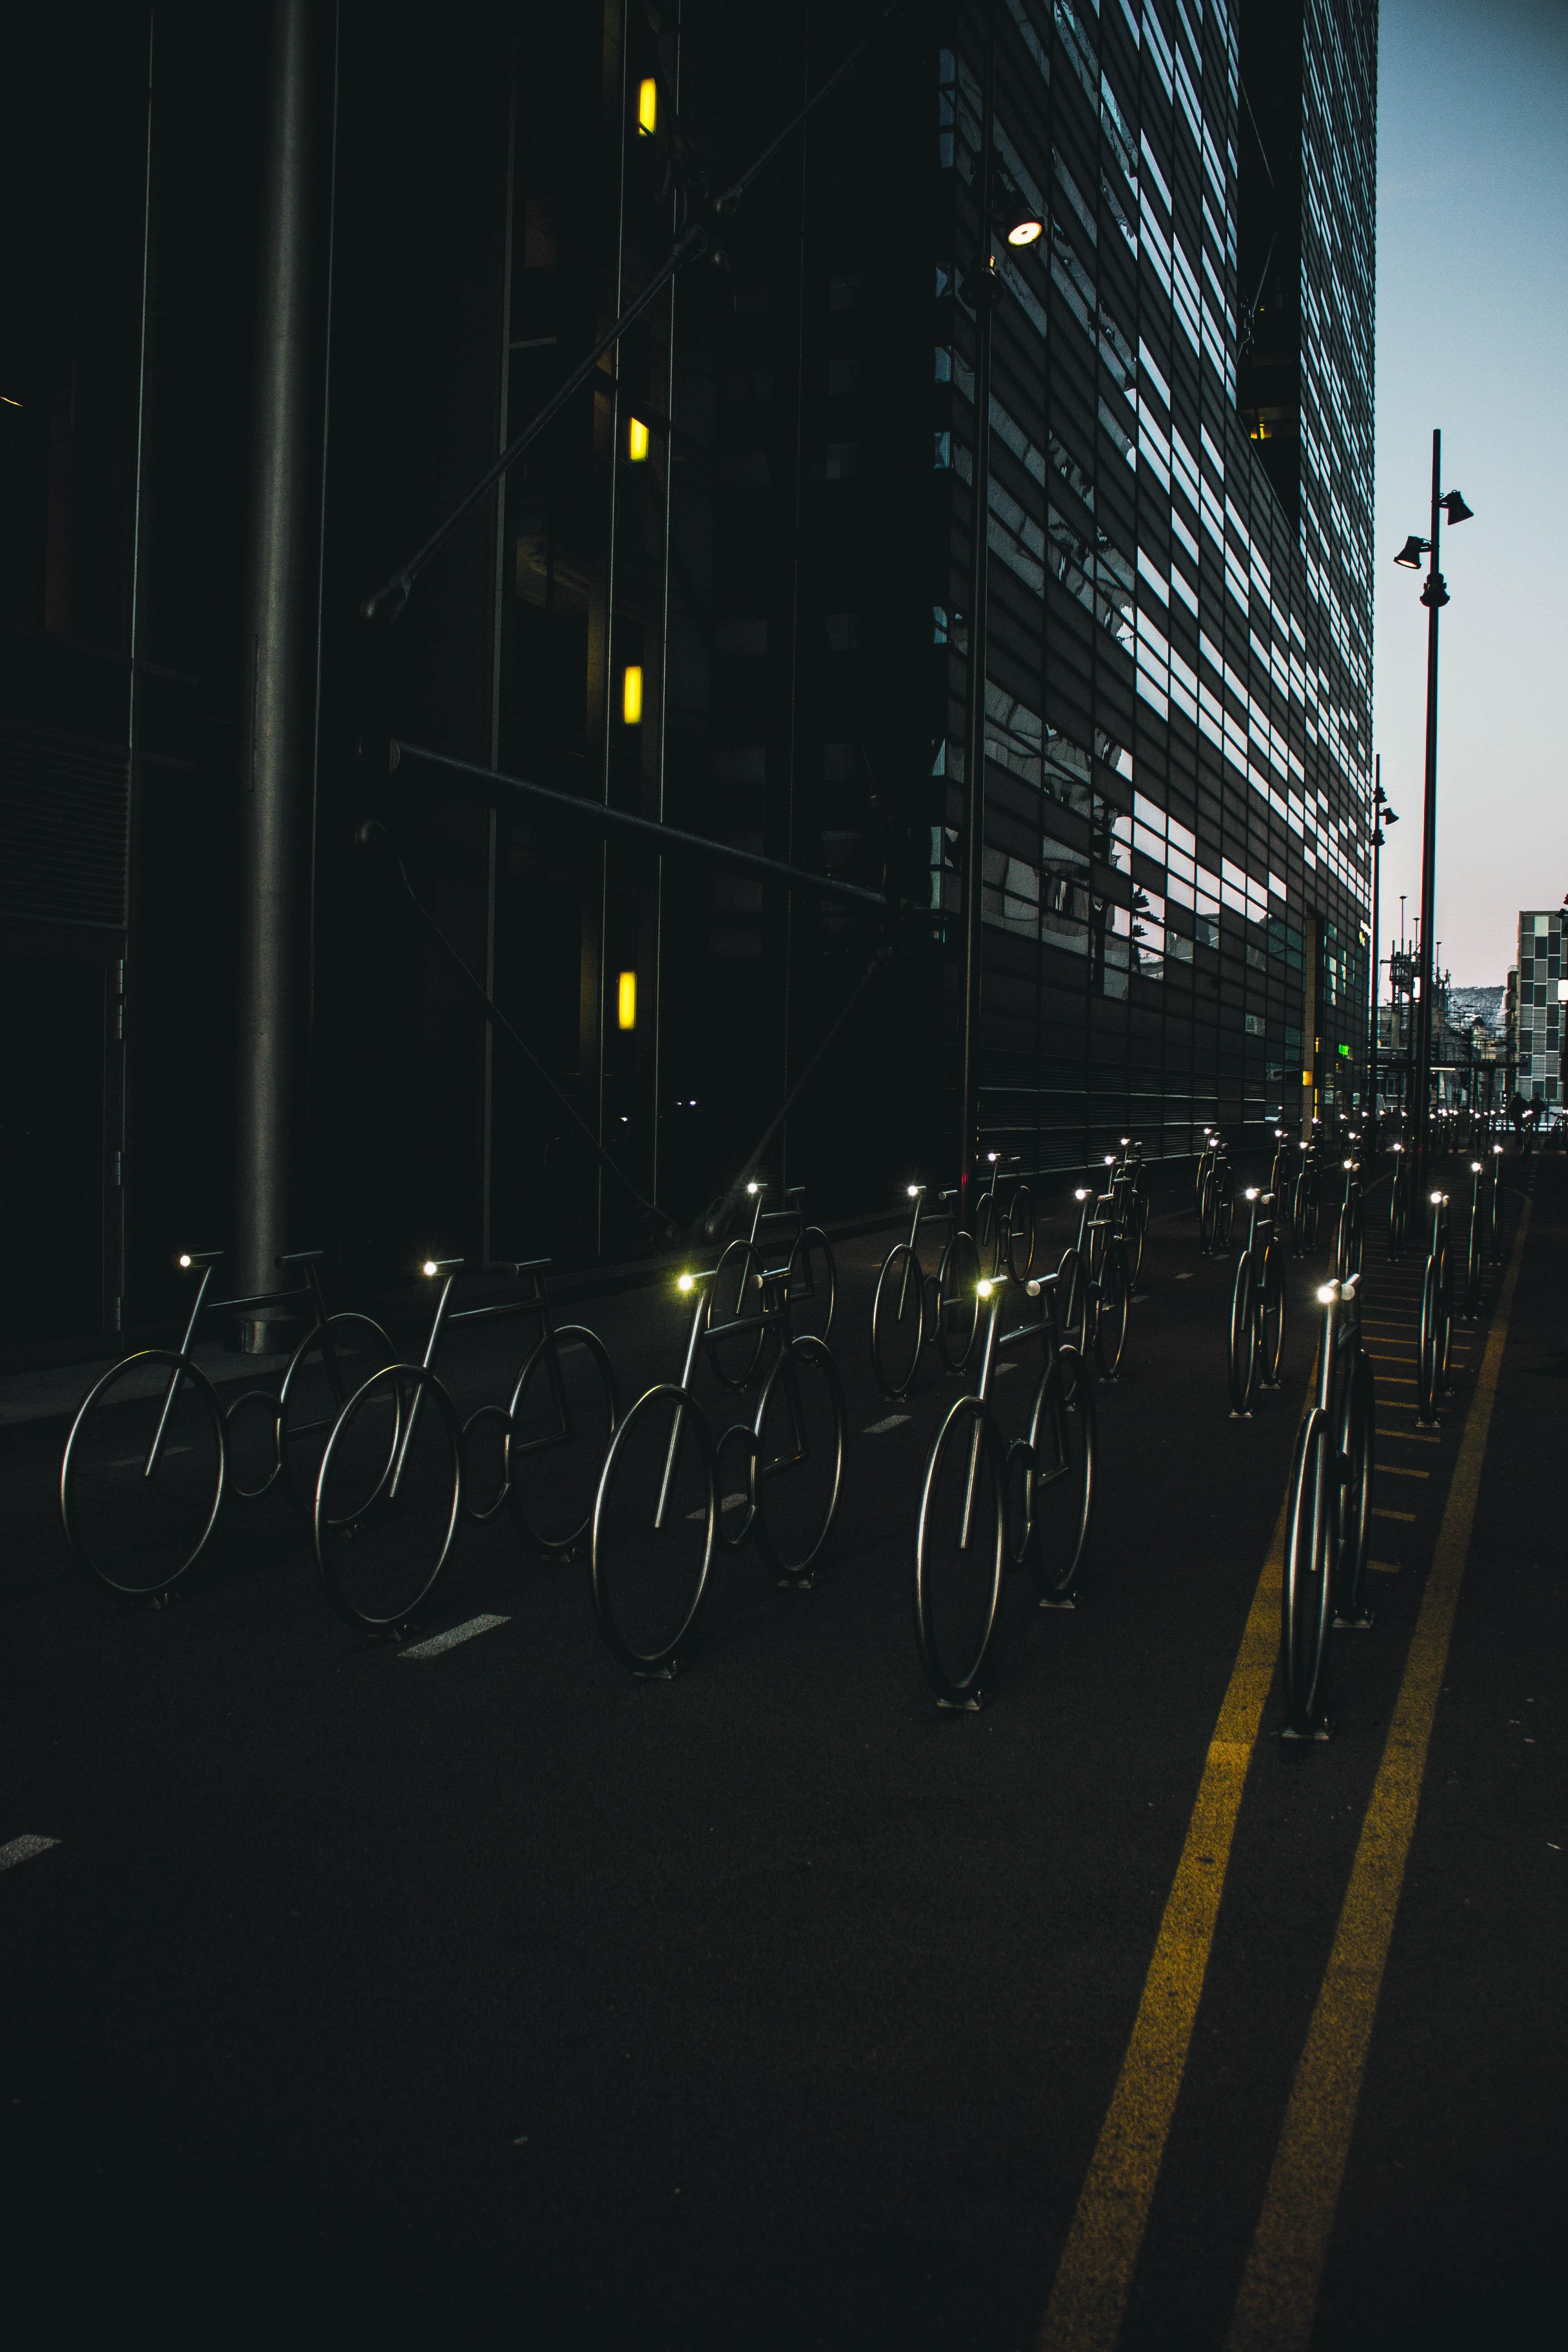 Gray Bike on Road Between Buildings, Architecture, Light streaks, Transportation system, Street, HQ Photo